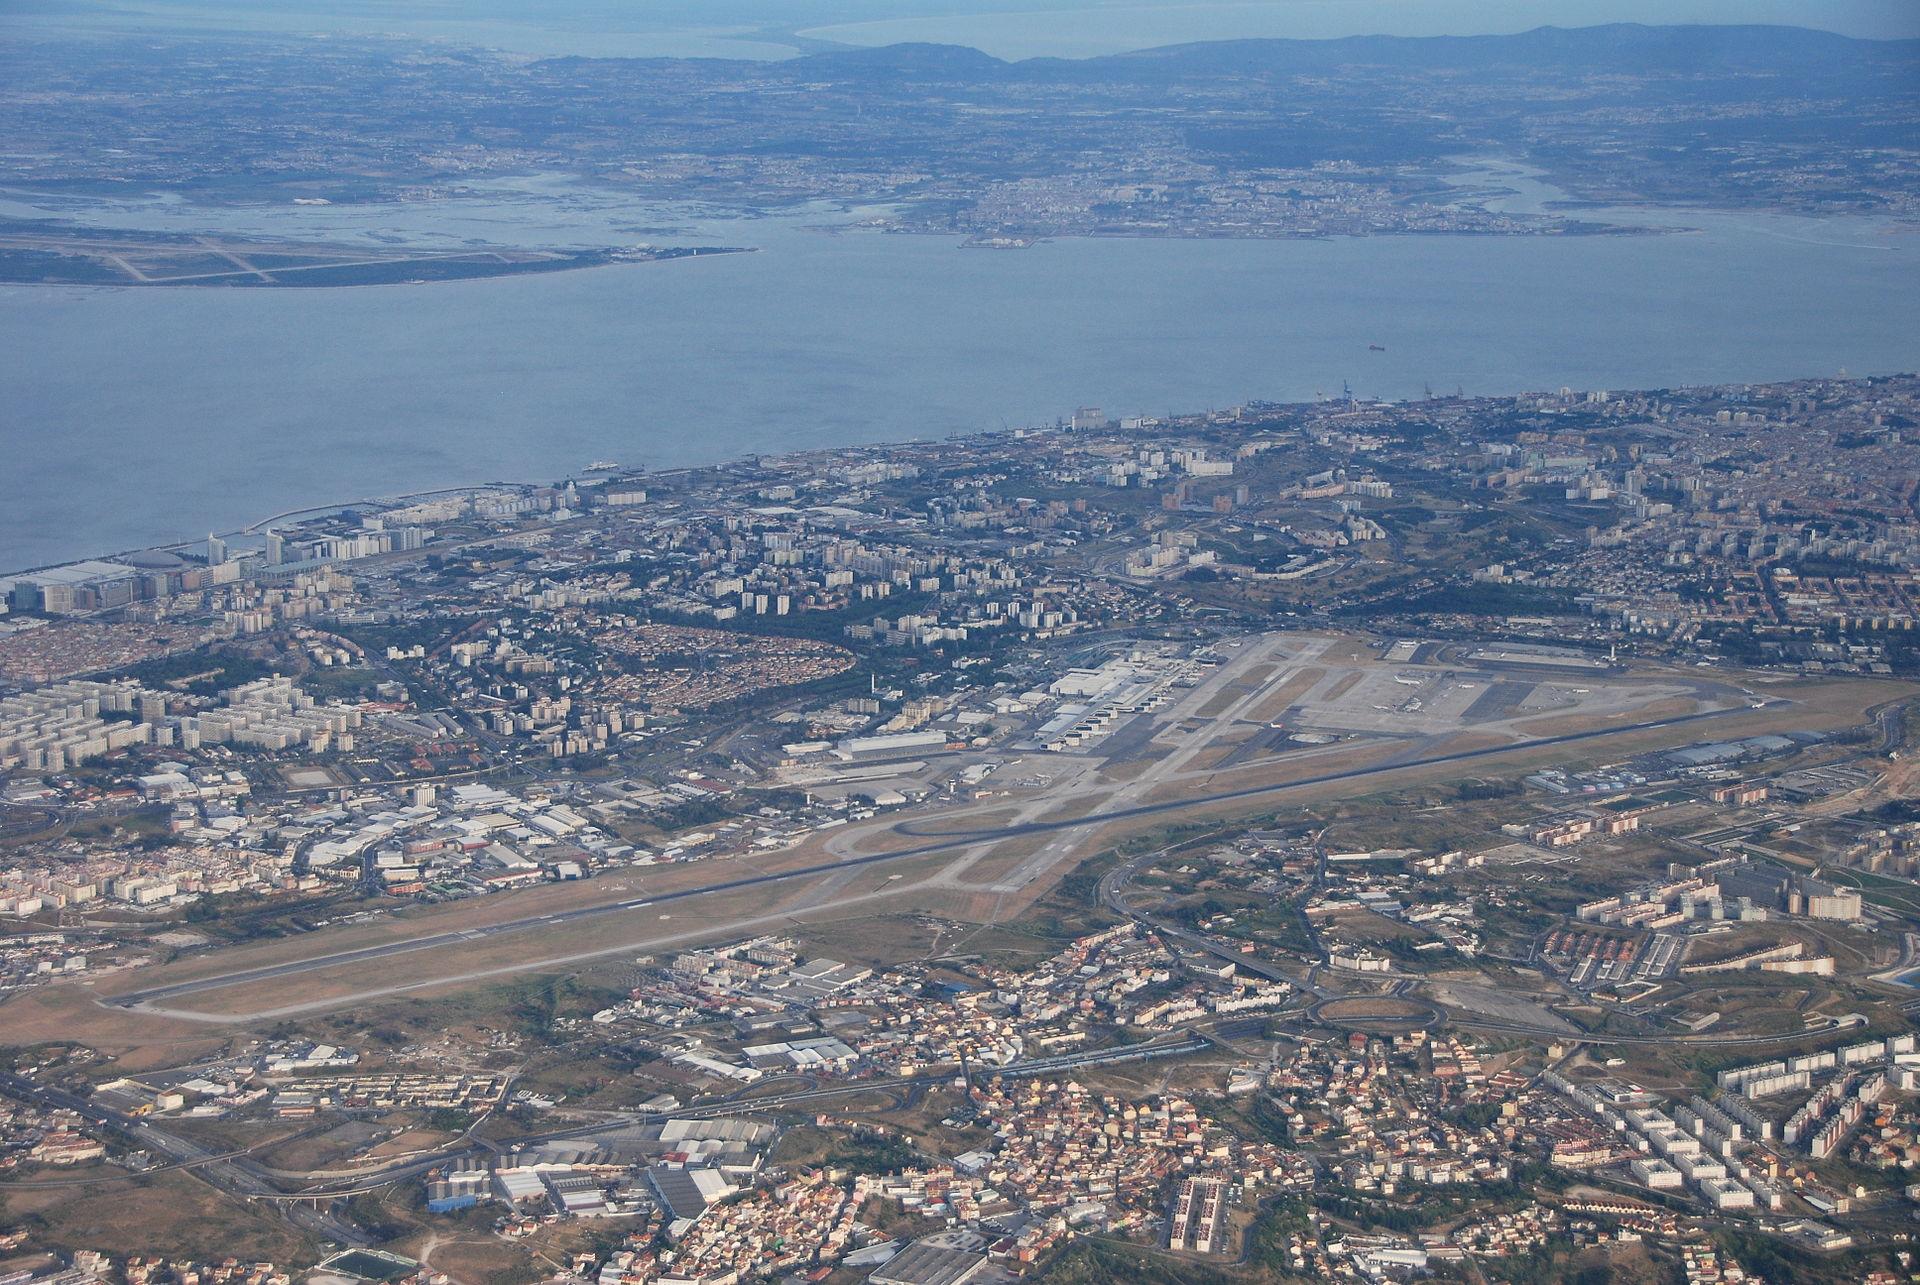 Aeroporto Lisbona : Aeroporto di lisbona wikipedia